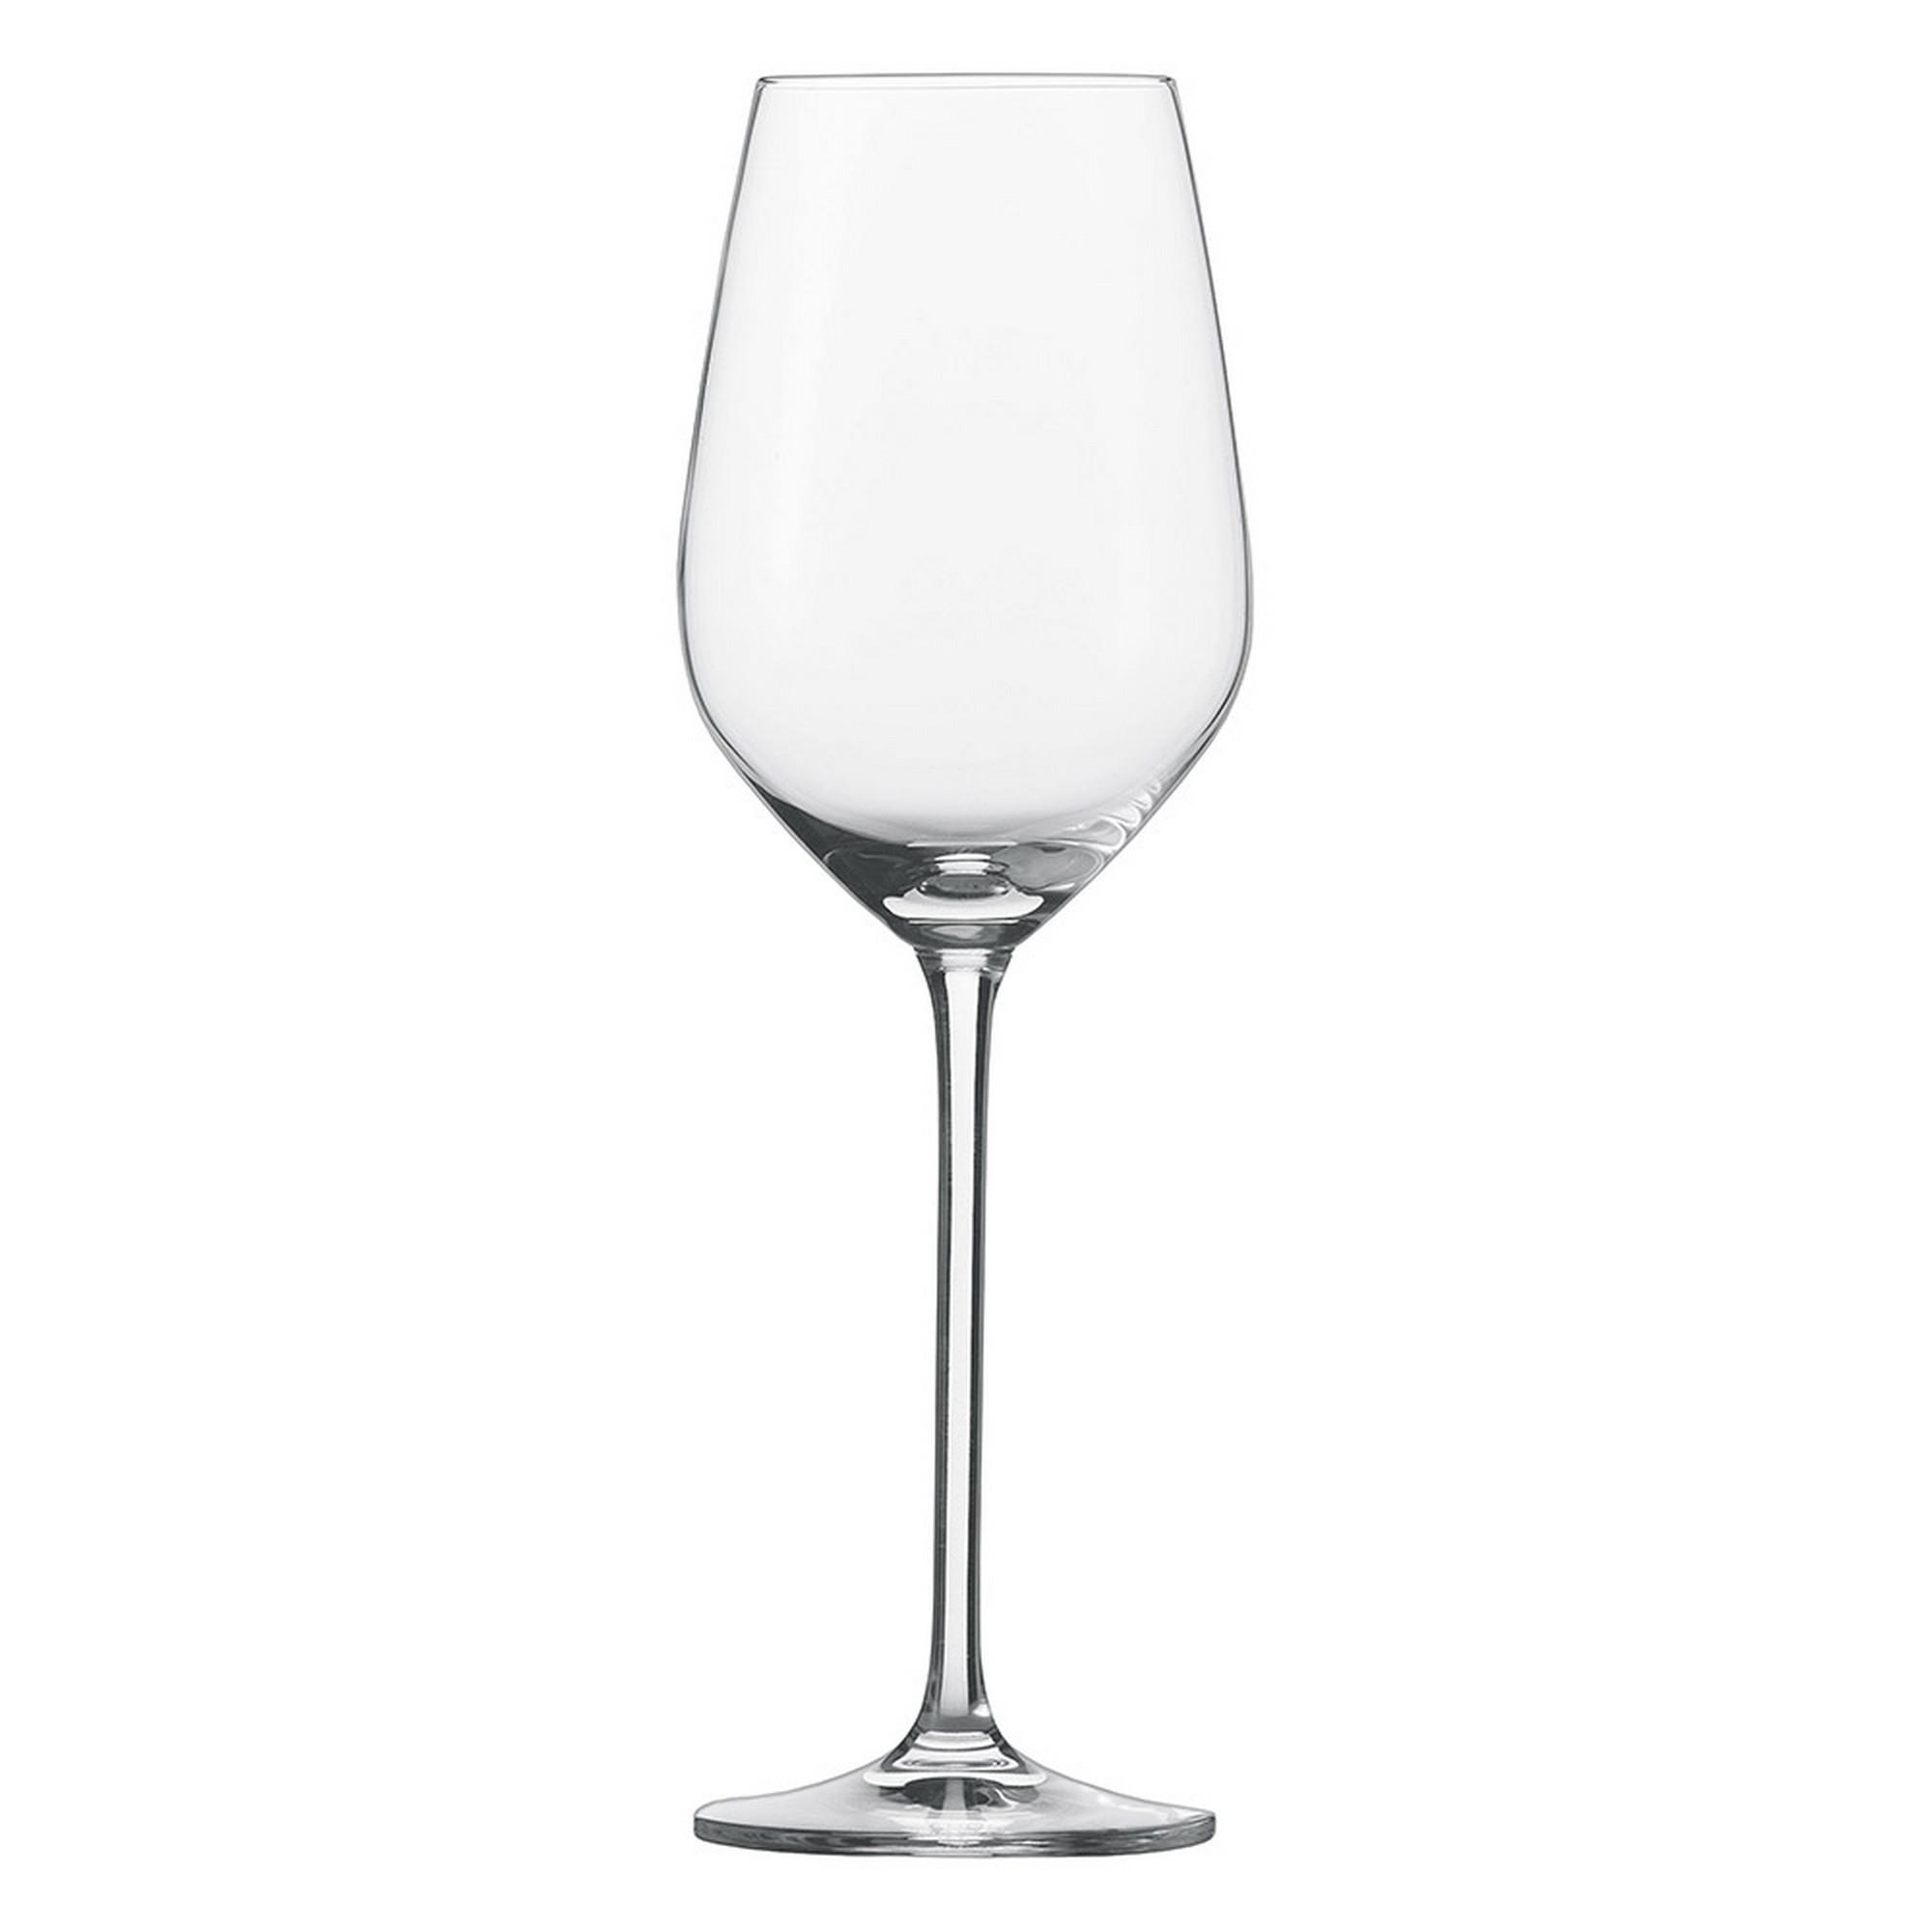 Taça para Vinho Branco 420ml Schott Zwiesel Fortissimo 6 Peças de Cristal